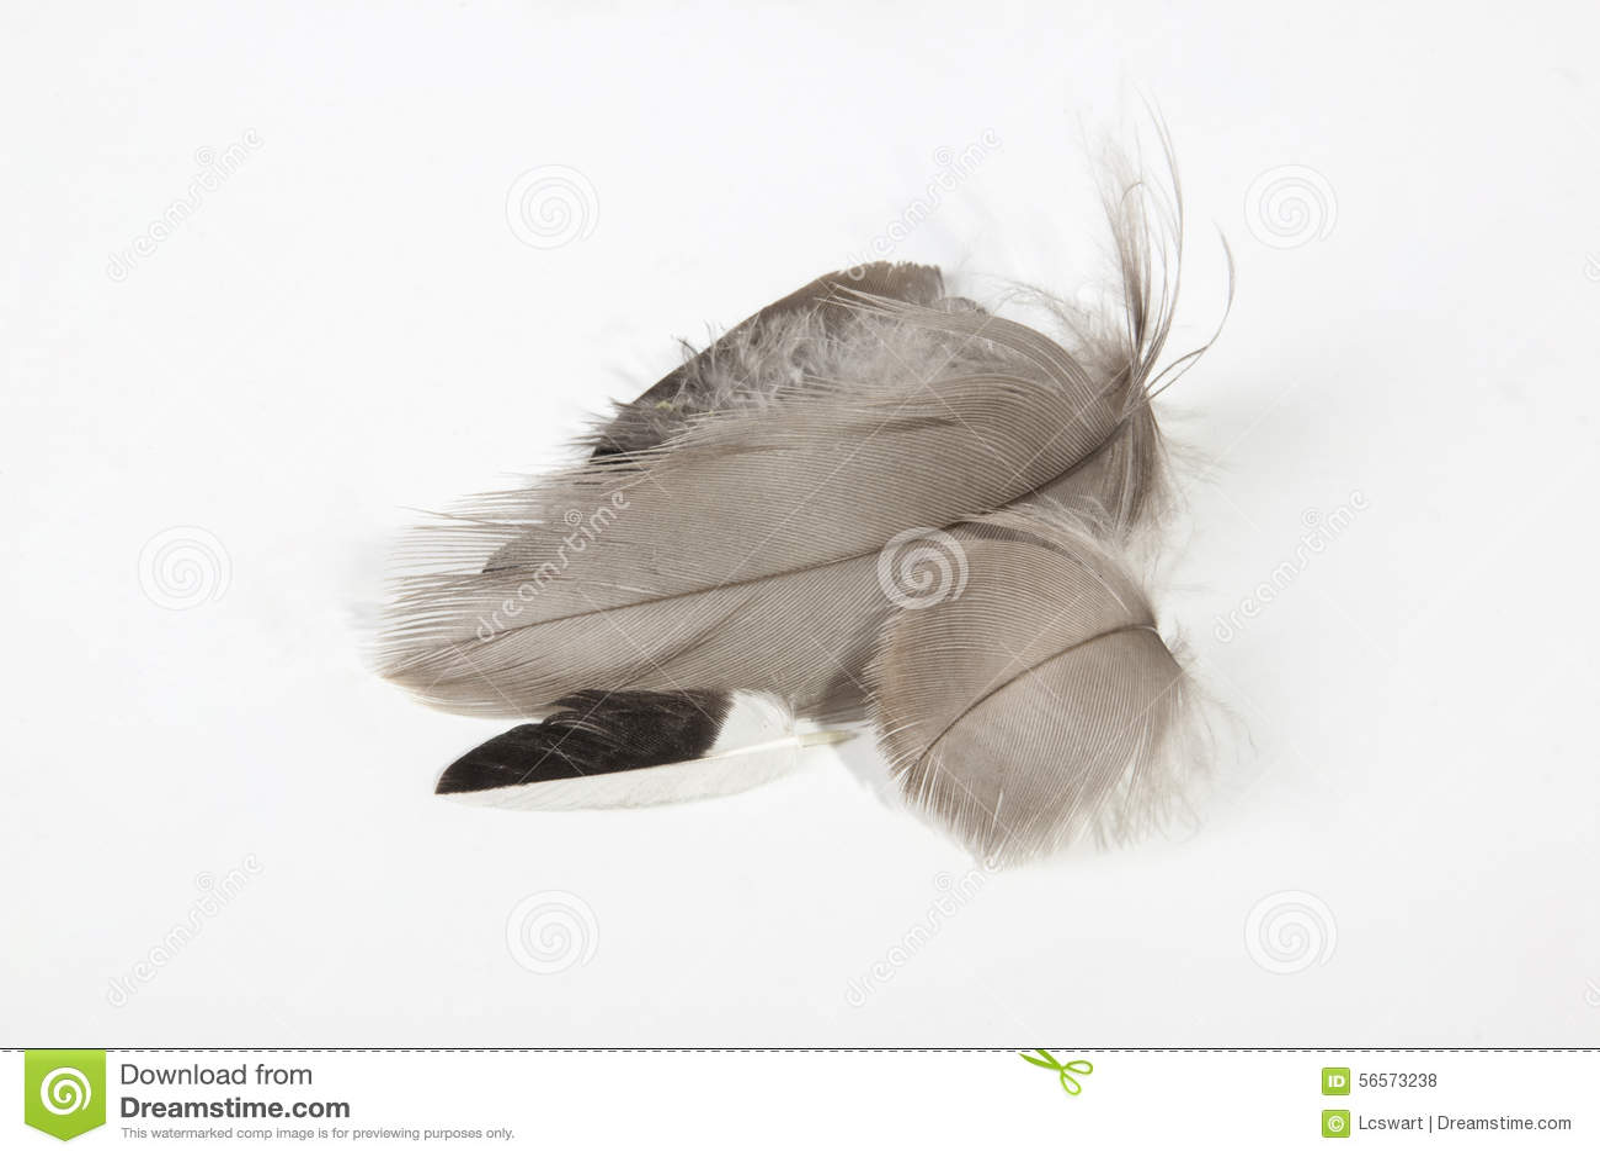 Download Τέσσερα μικρά λεπτόκοκκα γκρίζα φτερά στο λευκό Στοκ Εικόνες - εικόνα από απομονωμένος, εύθραυστος: 56573238